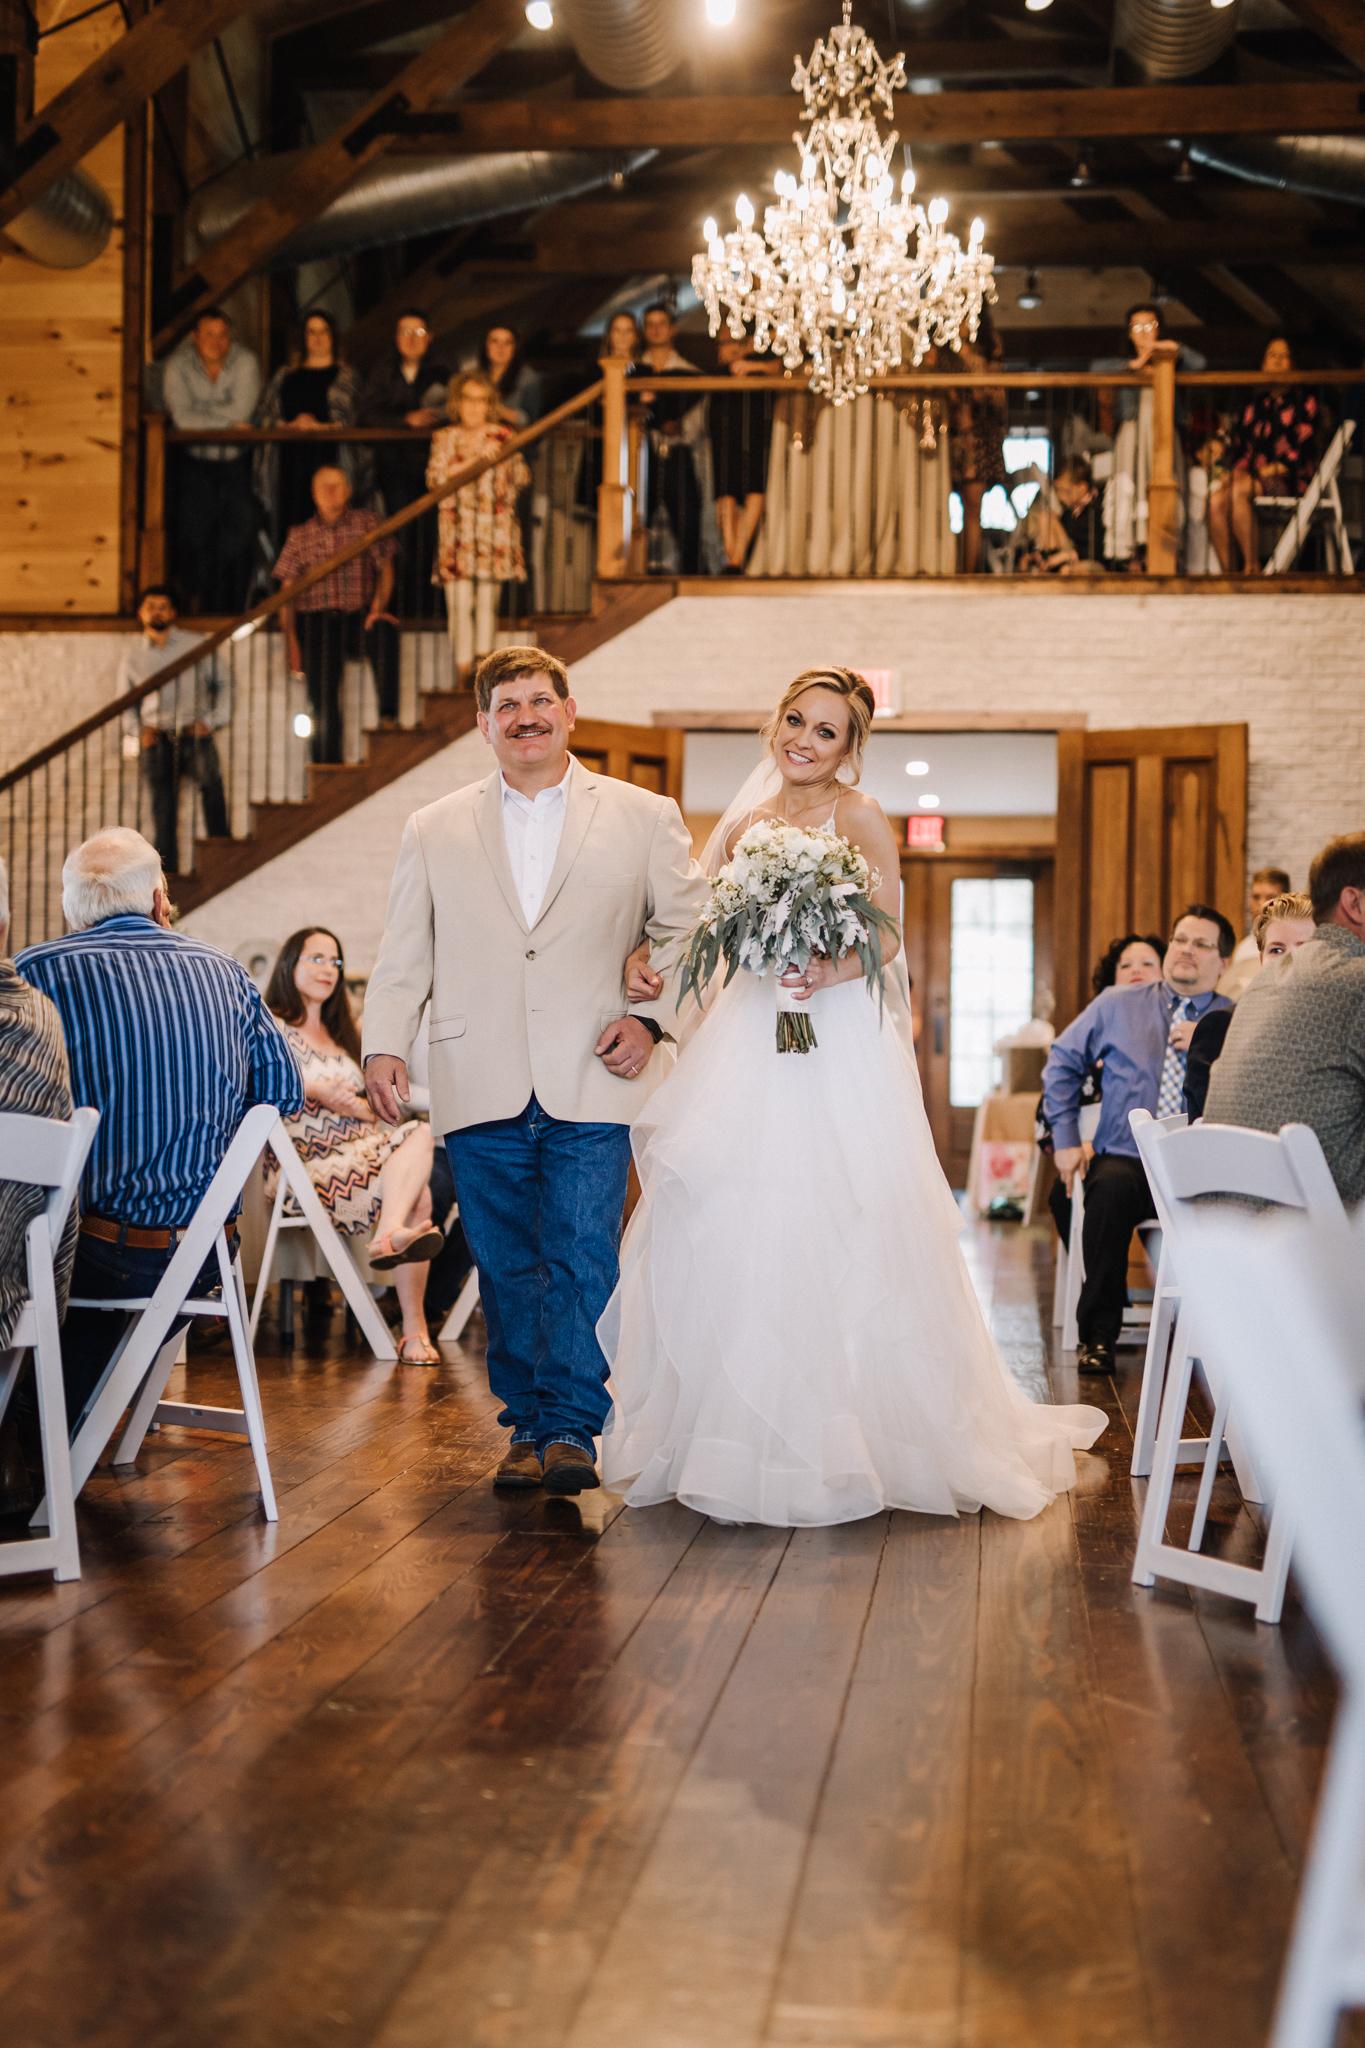 billie-shaye style photography - www.billieshayestyle.com - spring boho shabby chic western wedding - the cedars at carr farm - nashville tennessee-6635.jpg